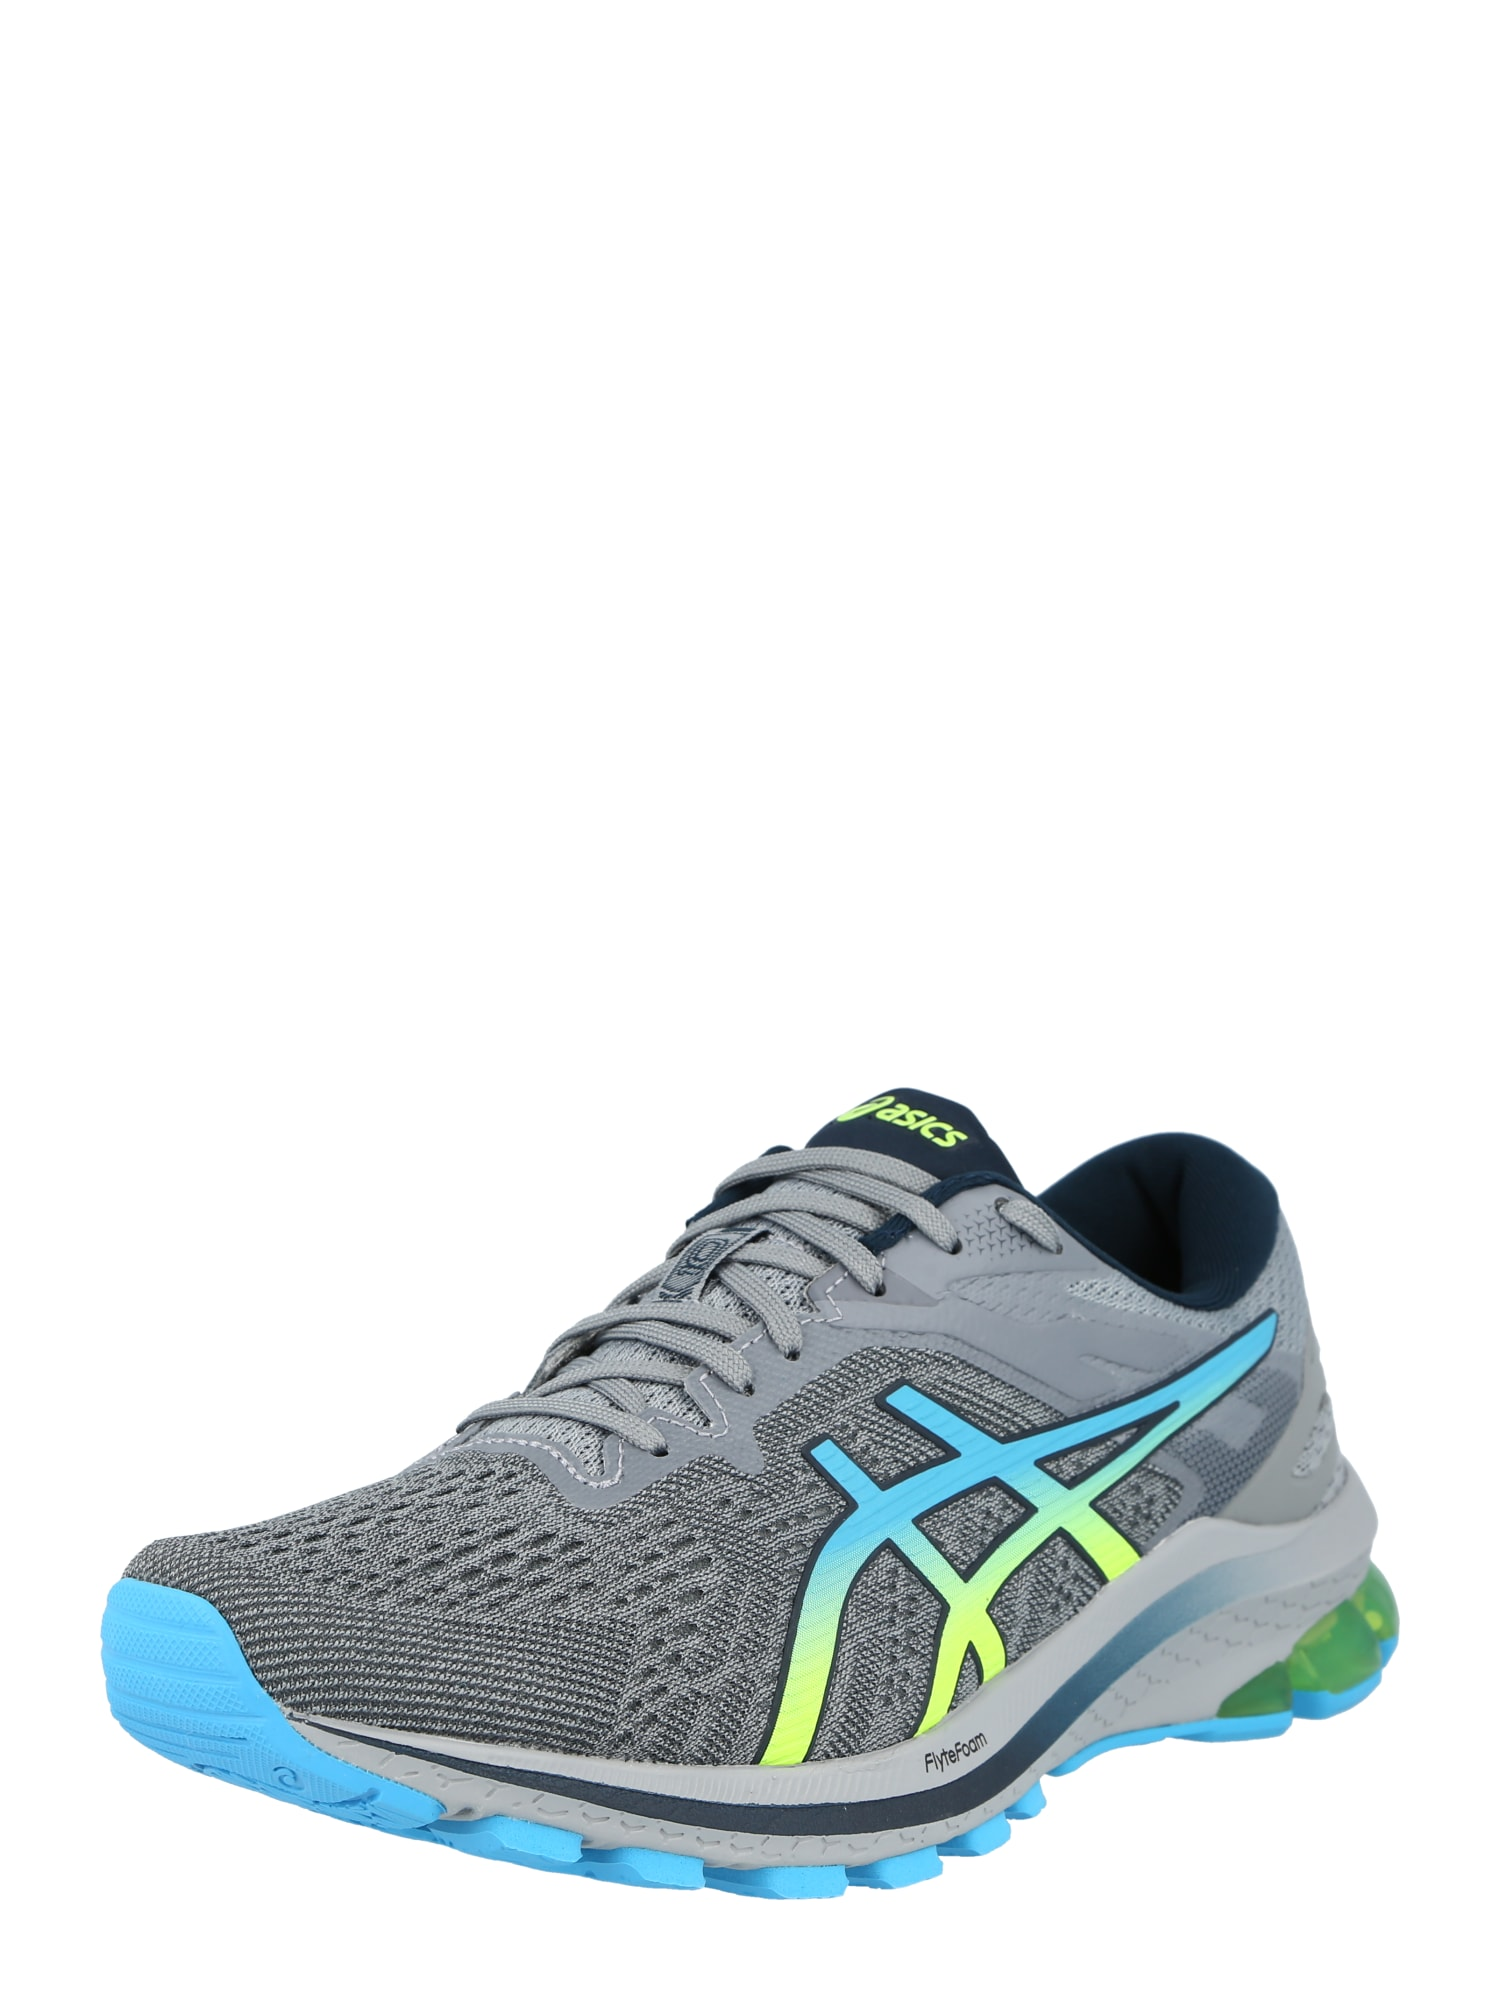 ASICS Bėgimo batai margai juoda / pilka / mėlyna / geltona